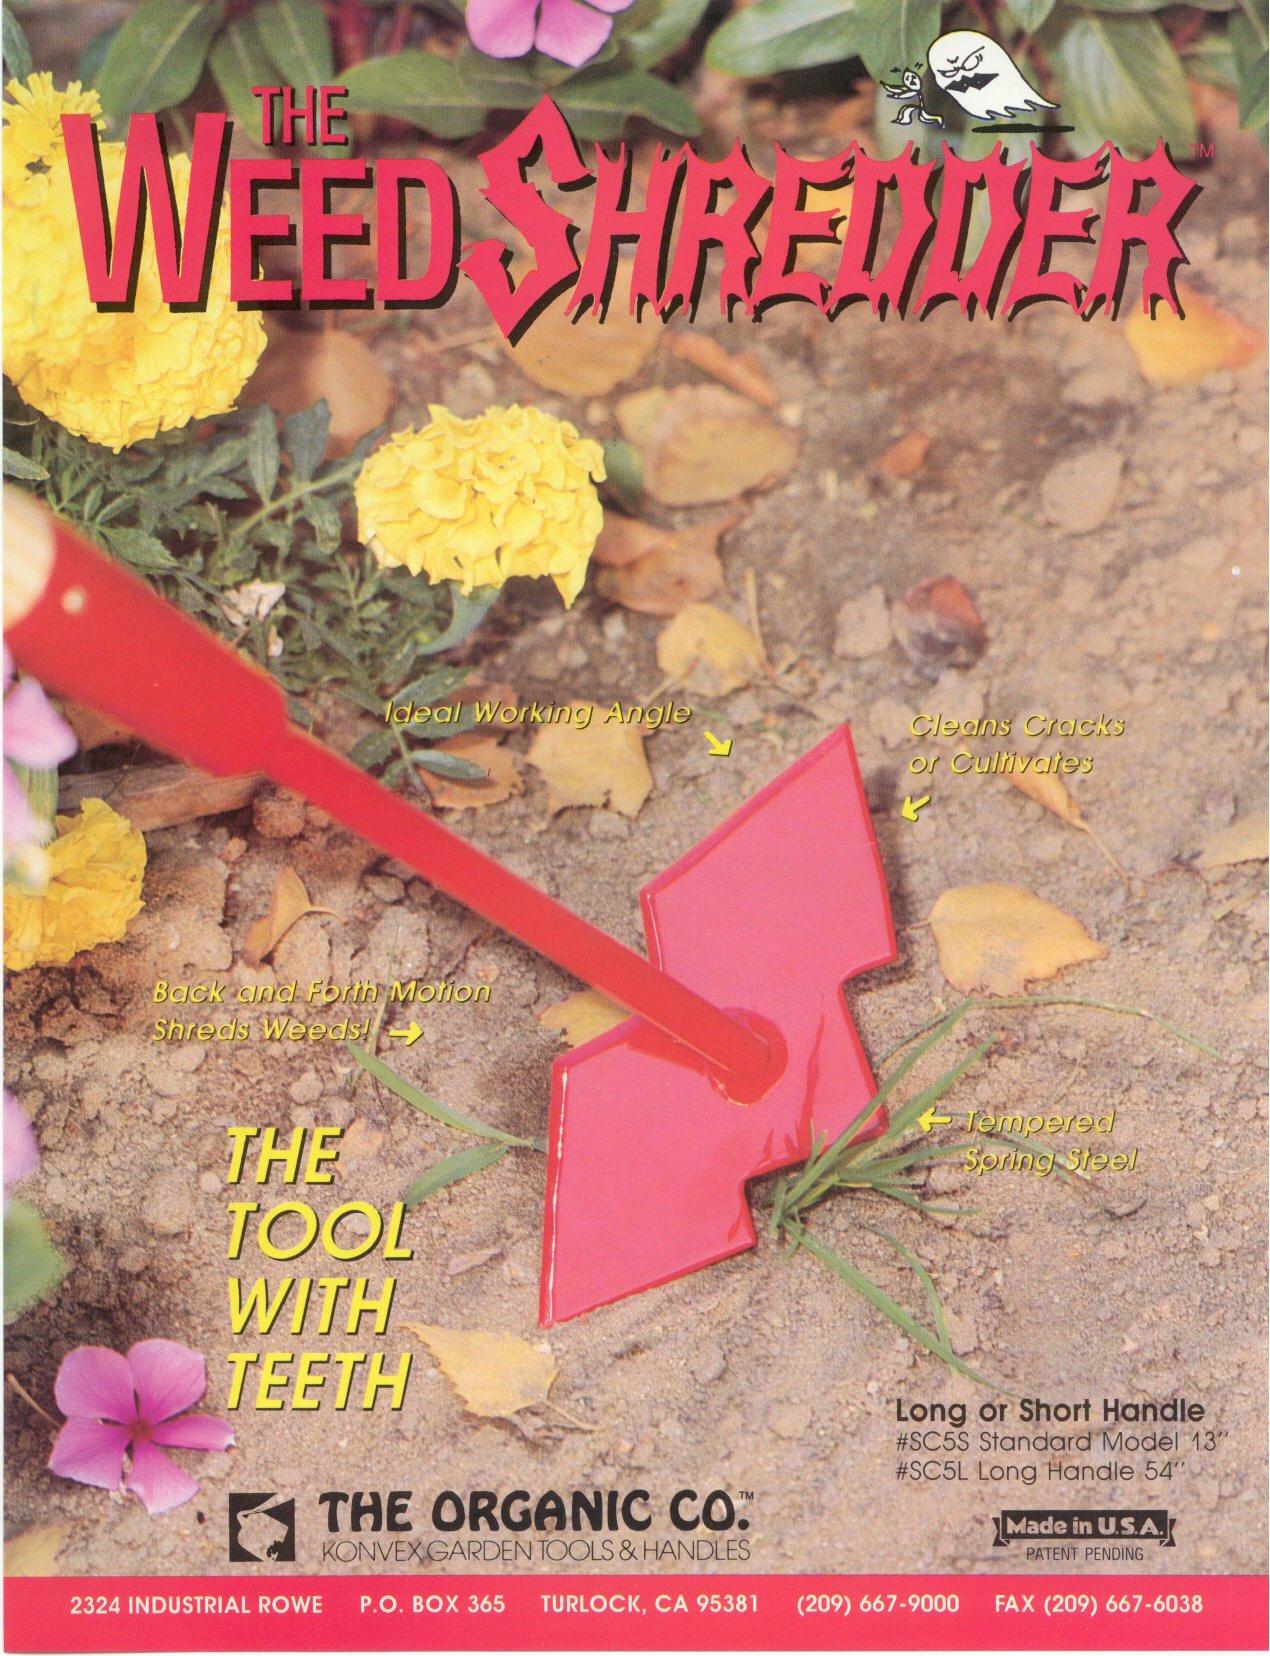 Weed Shredder Short and Long Handle Hoe (Short Handle 13 inch)